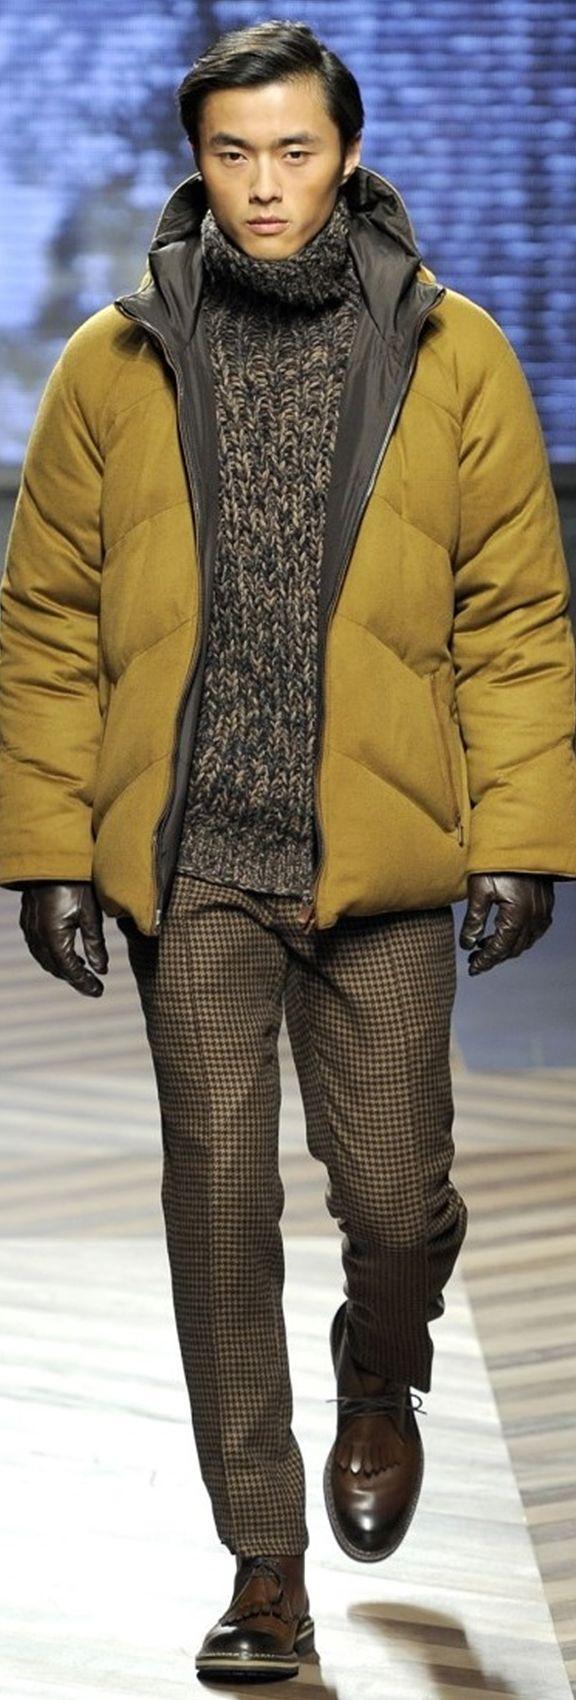 Ermenegildo Zegna | Men's Fashion | Menswear | Smart Casual | Men's Outfit for Fall/Winter | Shop at designerclothingfans.com